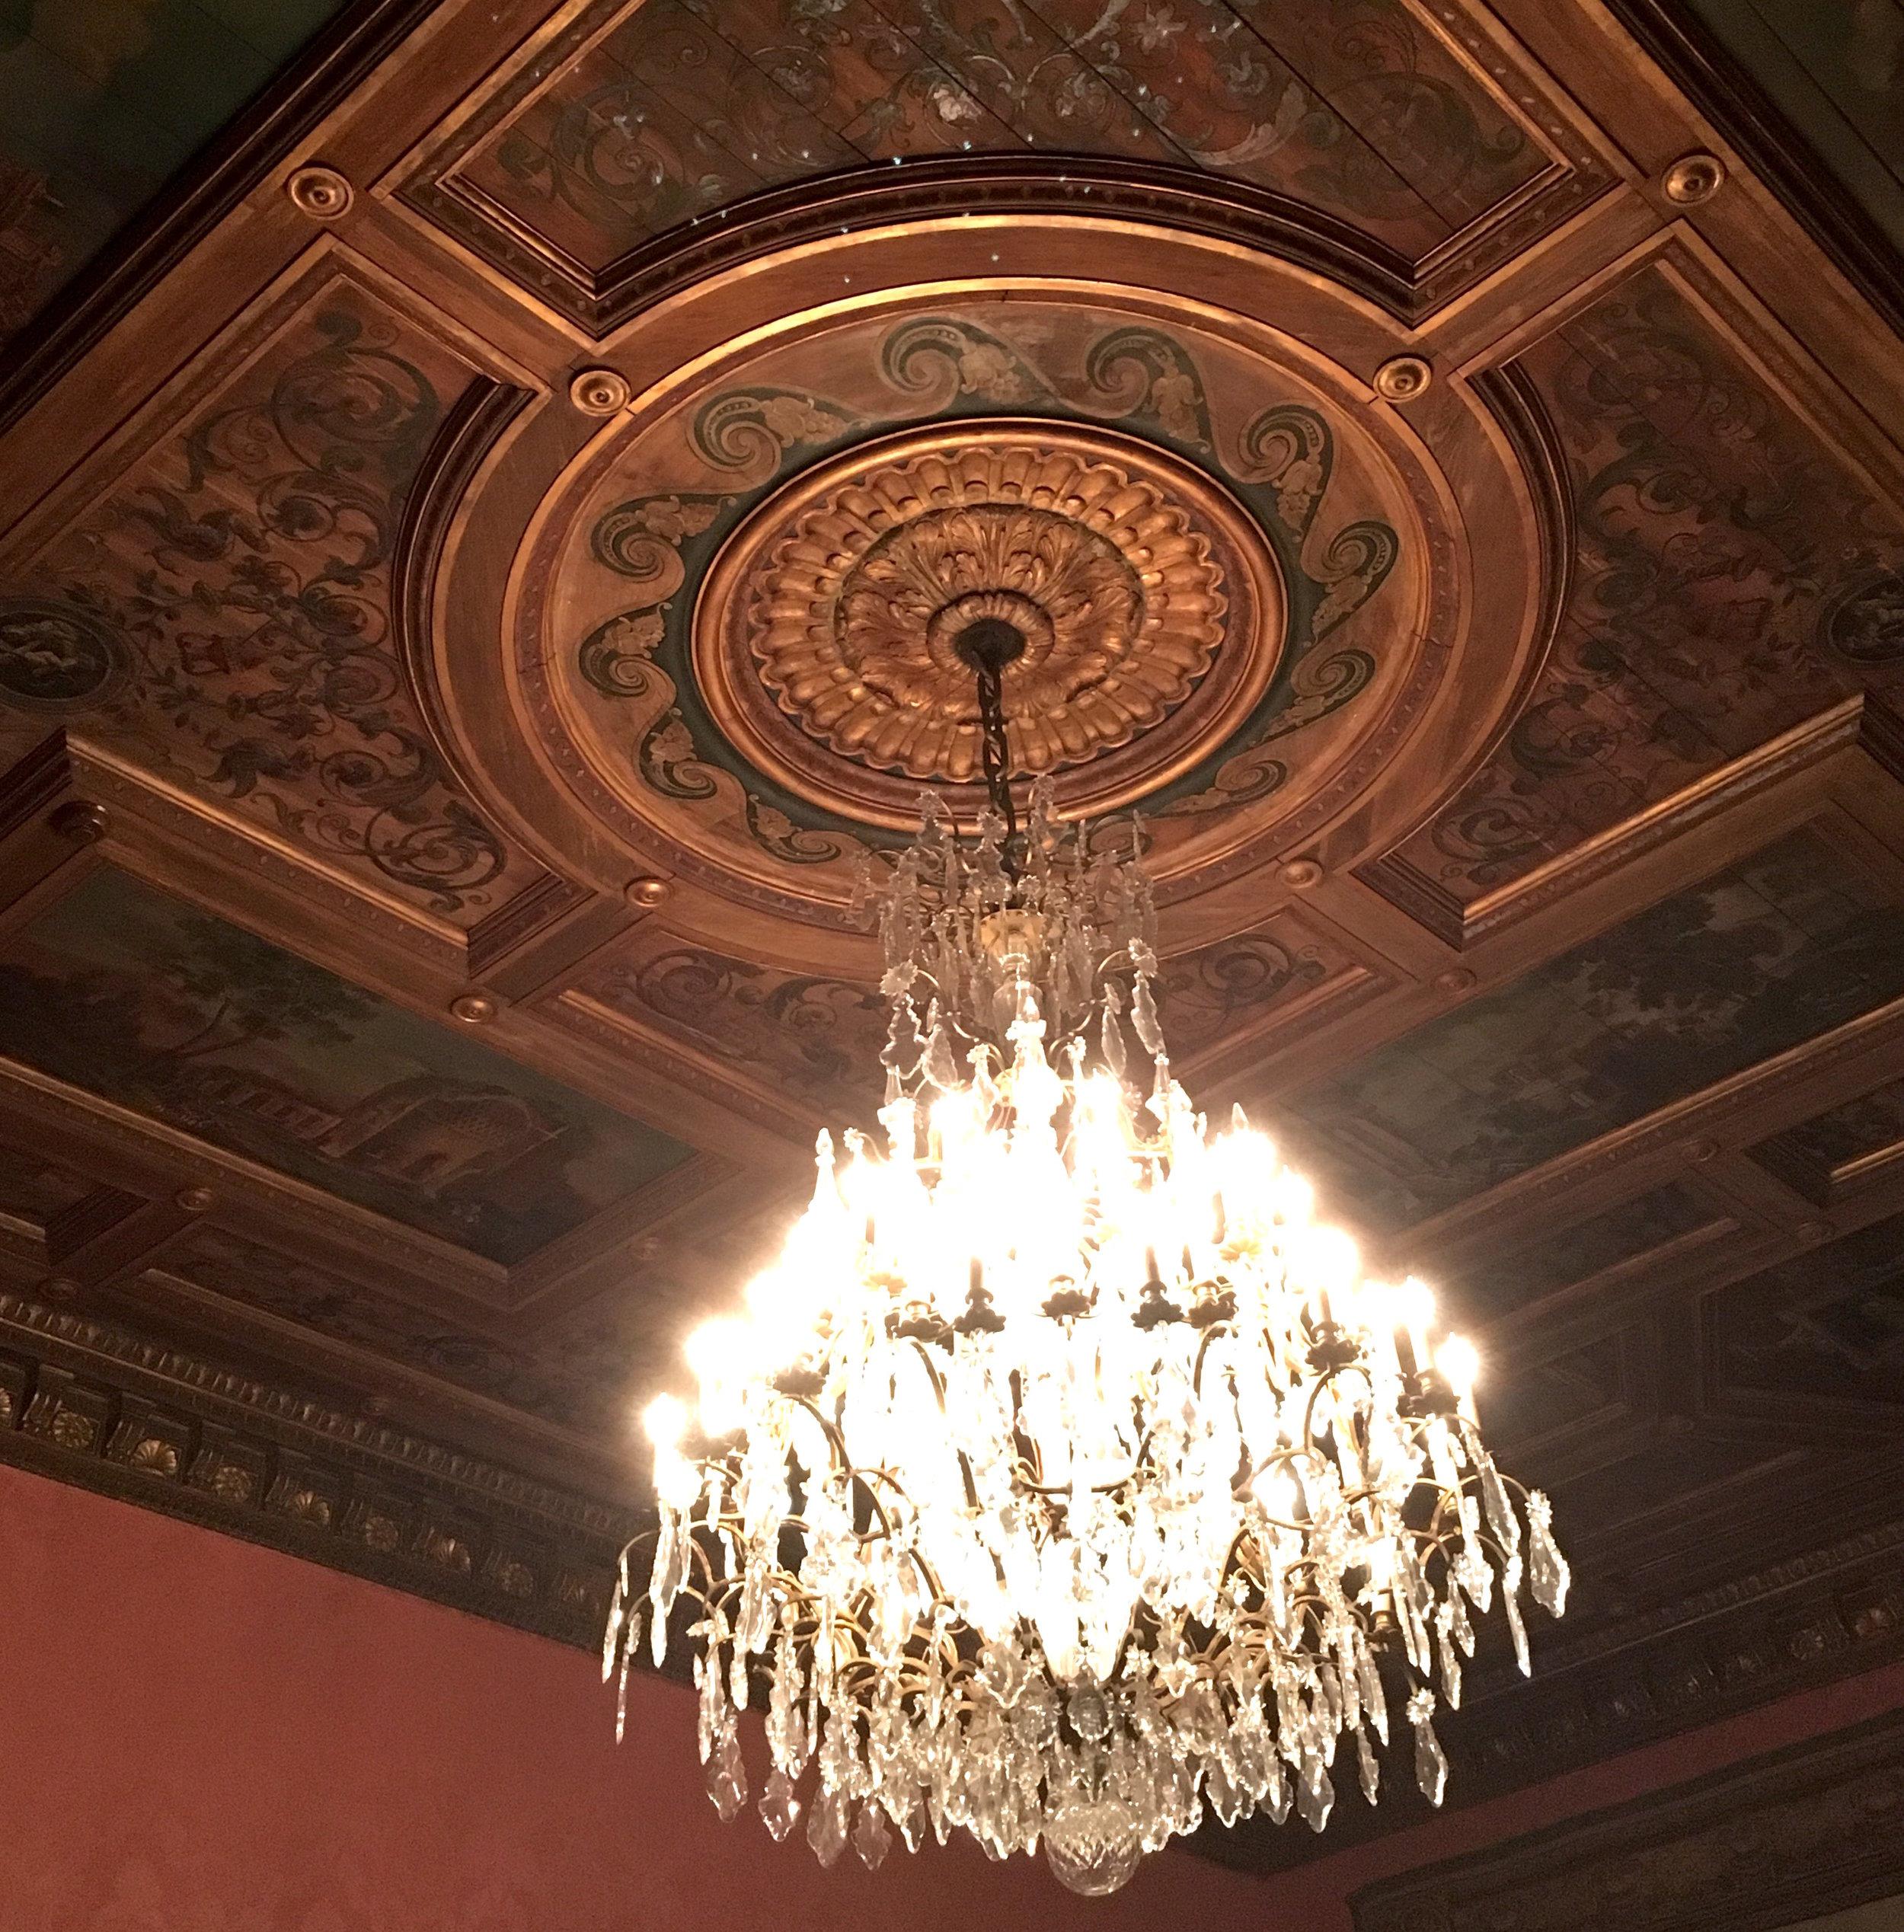 chandelier swinging was kept to a minimum